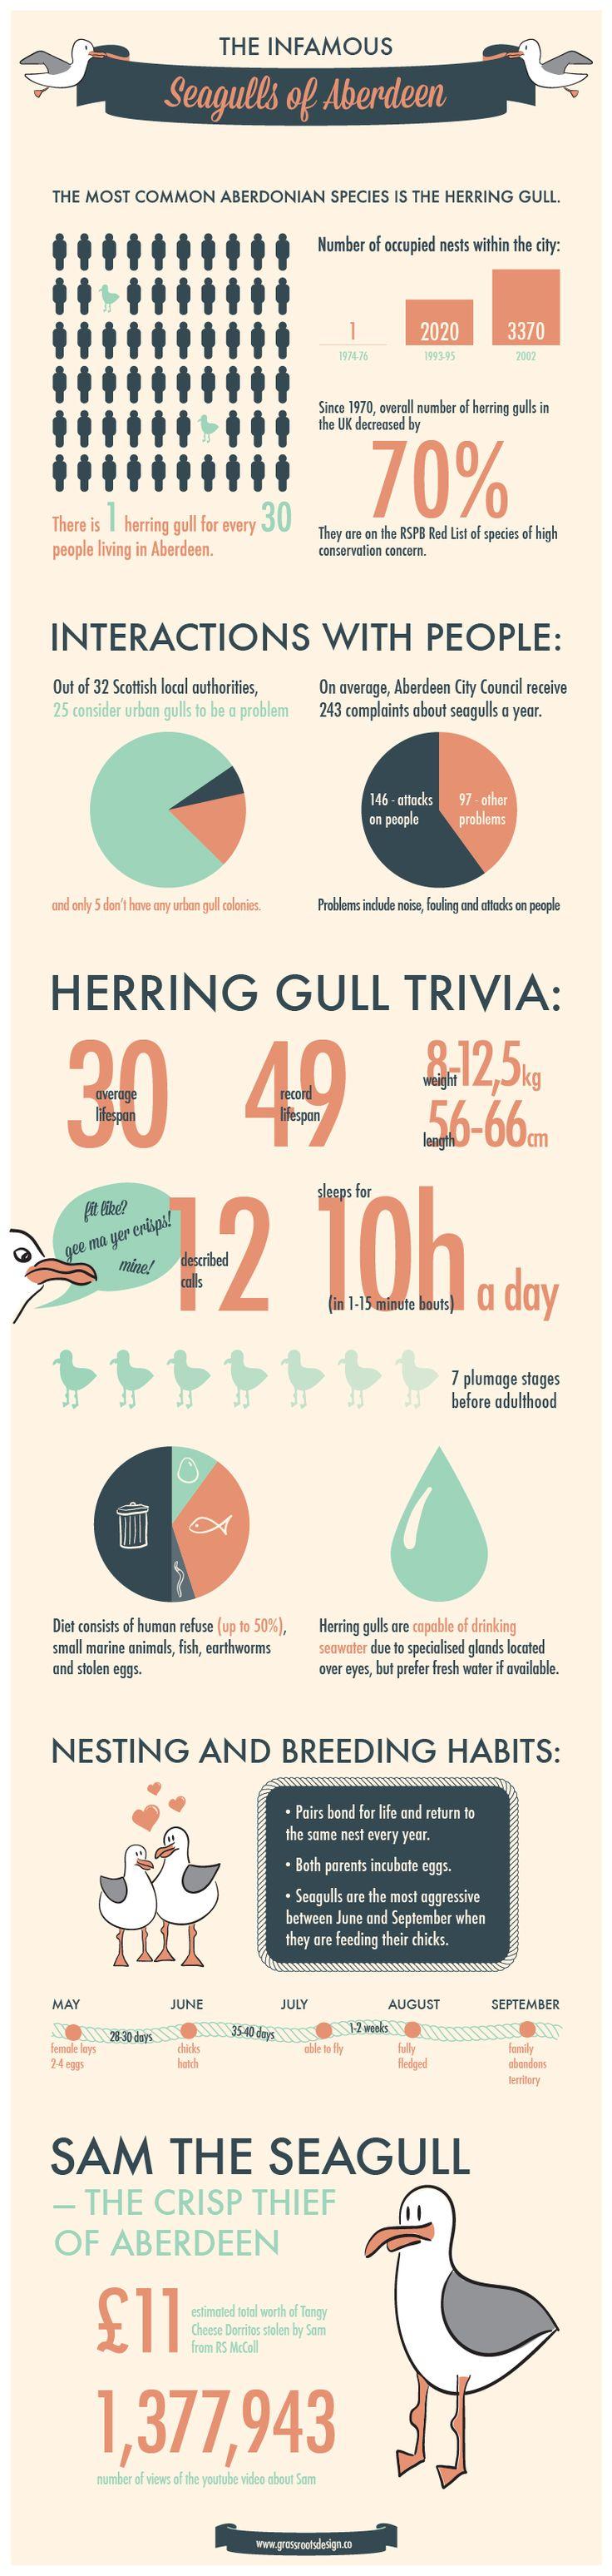 Infographic - Seagulls of Aberdeen. Source: www.grassrootsdesign.co #infographic #infographics #aberdeen #seagulls